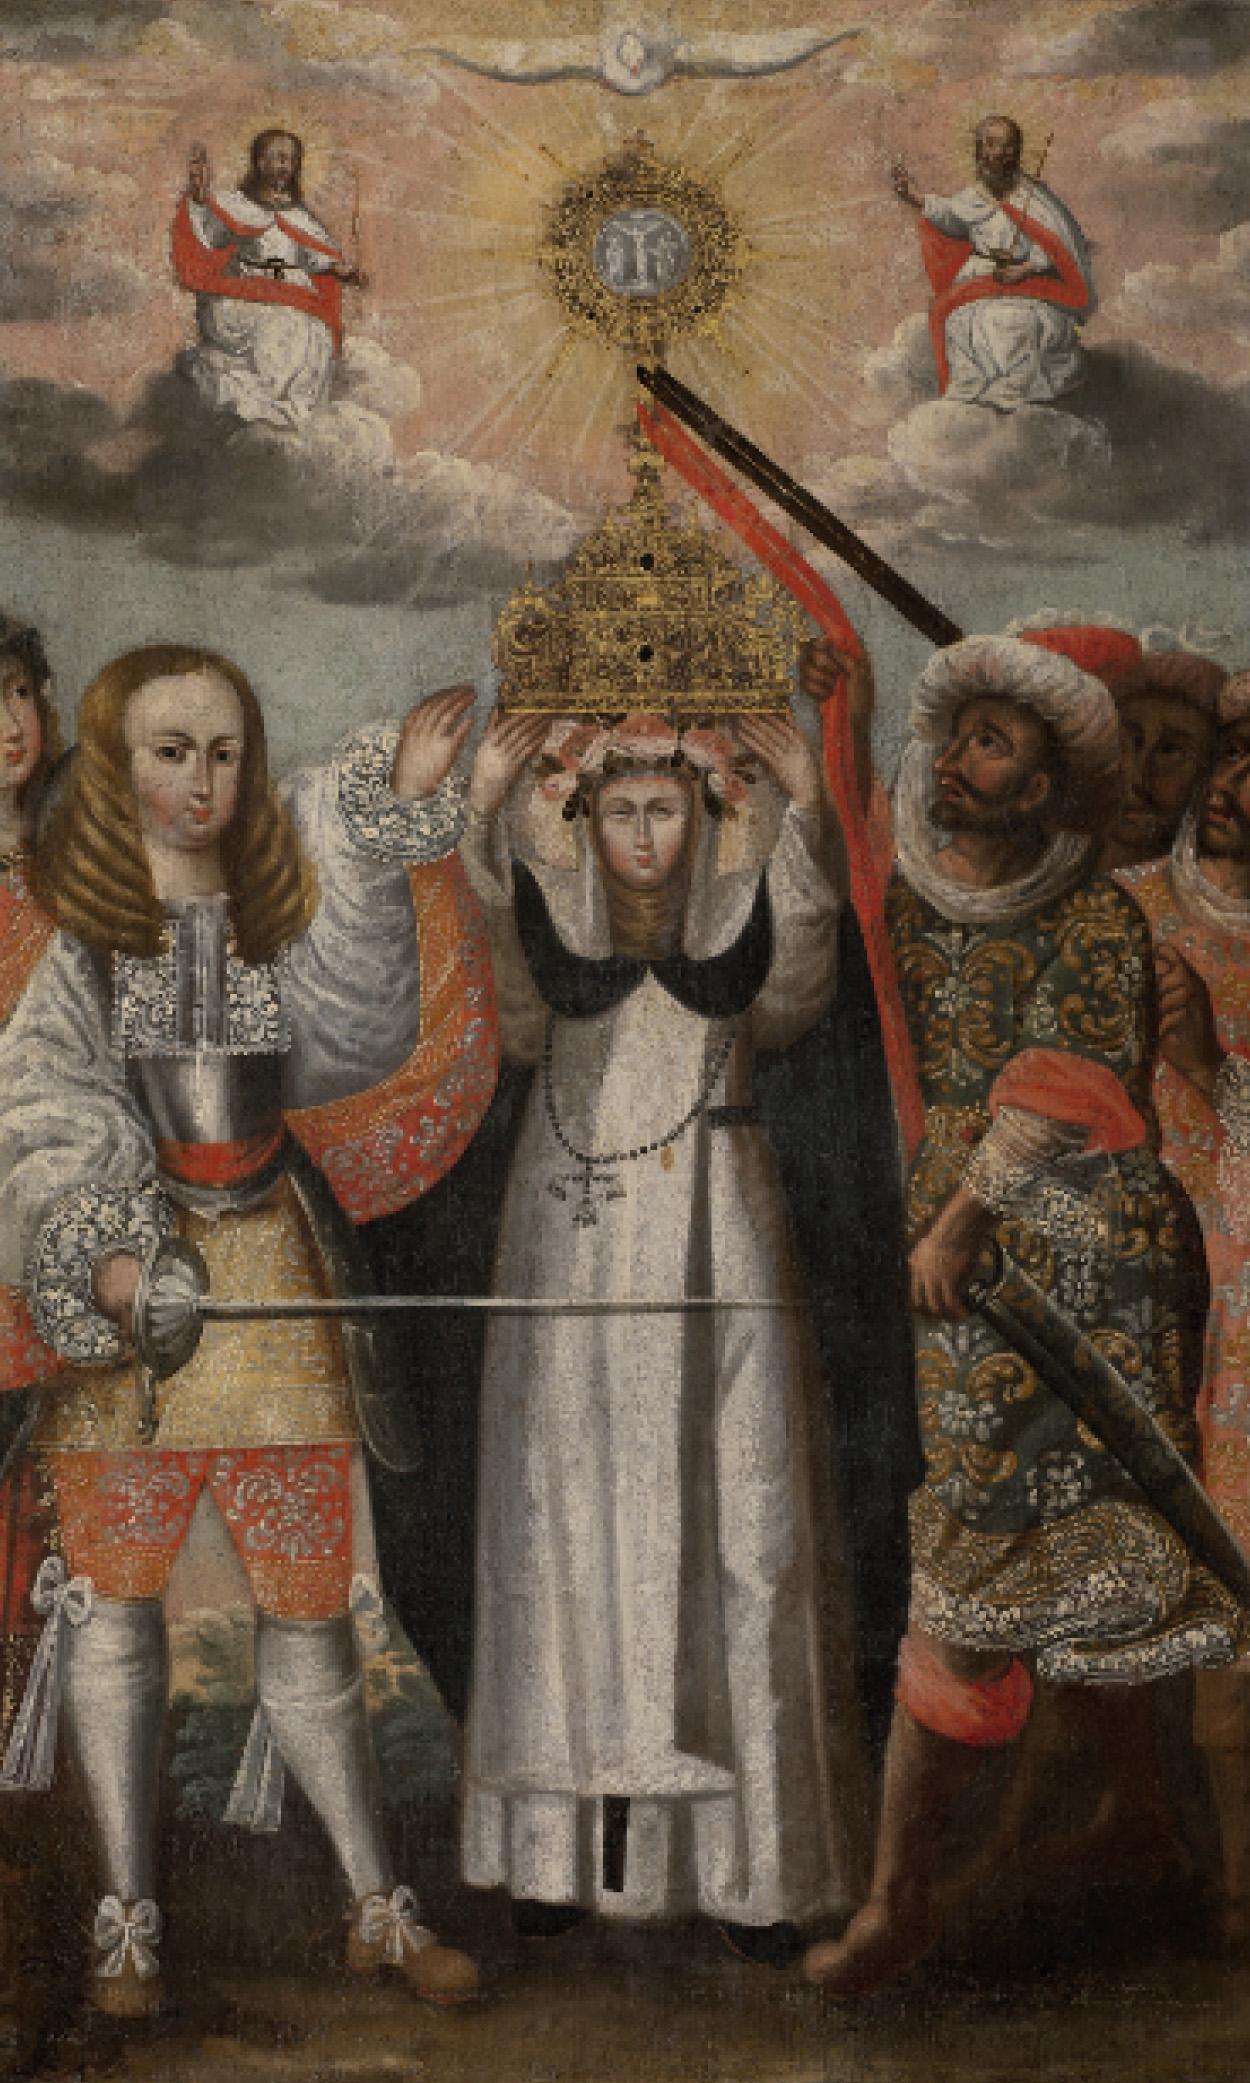 La Defensa de la Eucaristía con Santa Rosa